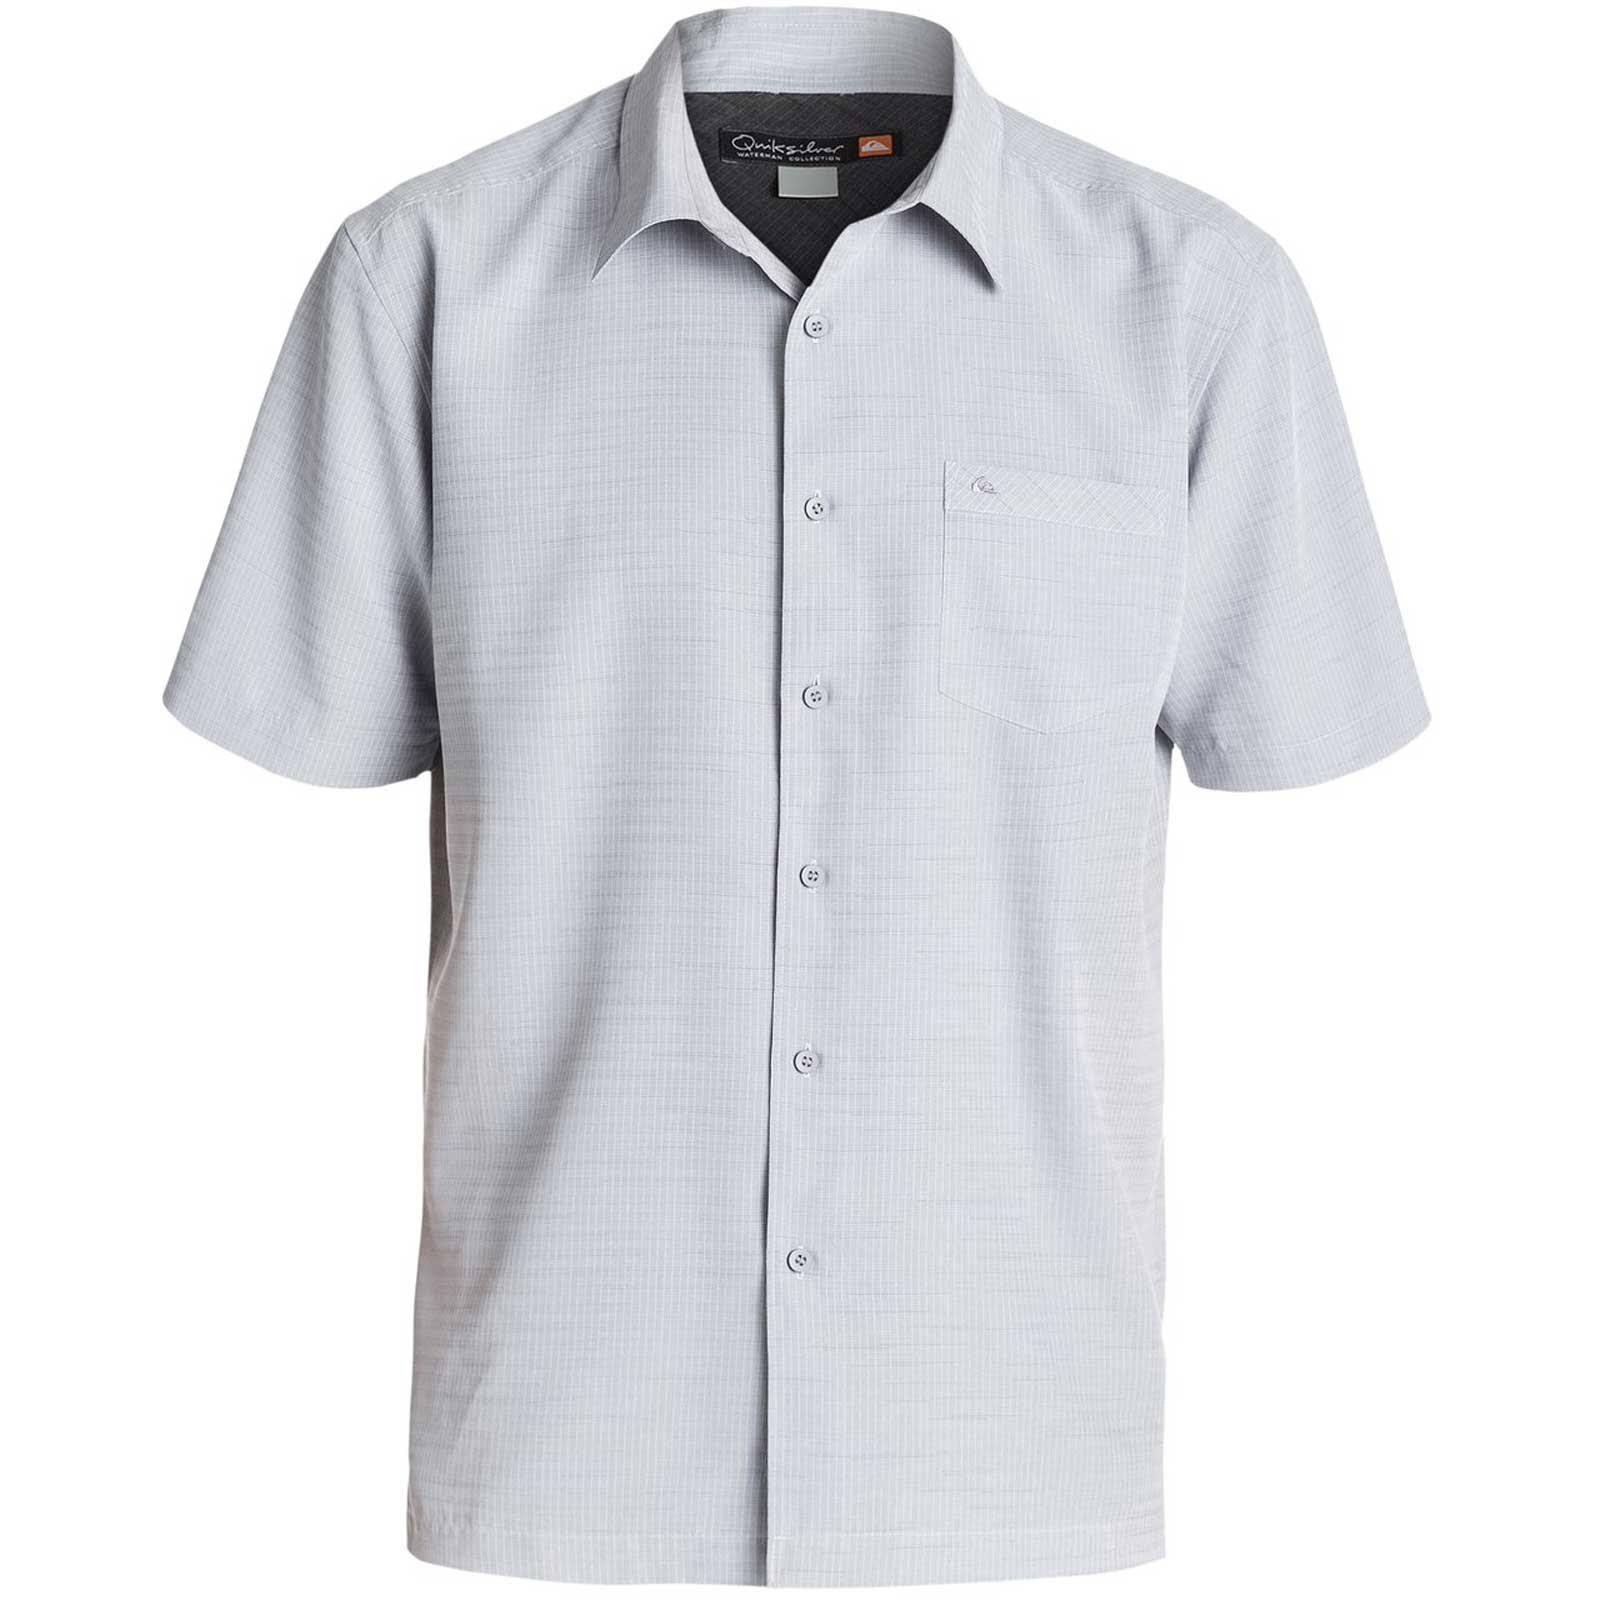 4 Zinc Camiseta Hombre Para Quiksilver Corta Manga Centinela aFFqExA